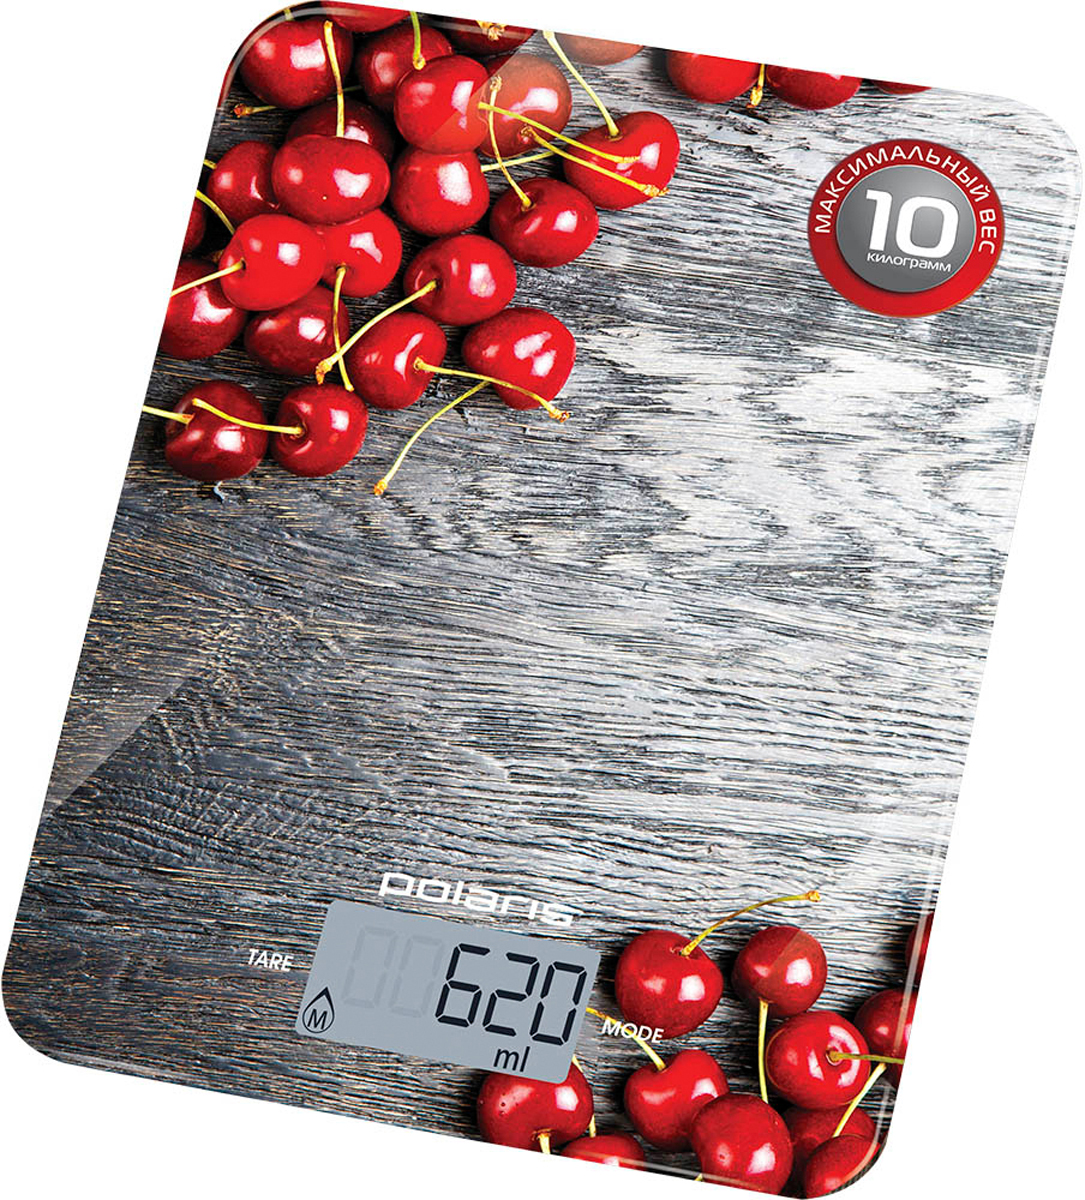 Polaris PKS 1046DG Cherry кухонные весы - Кухонные весы